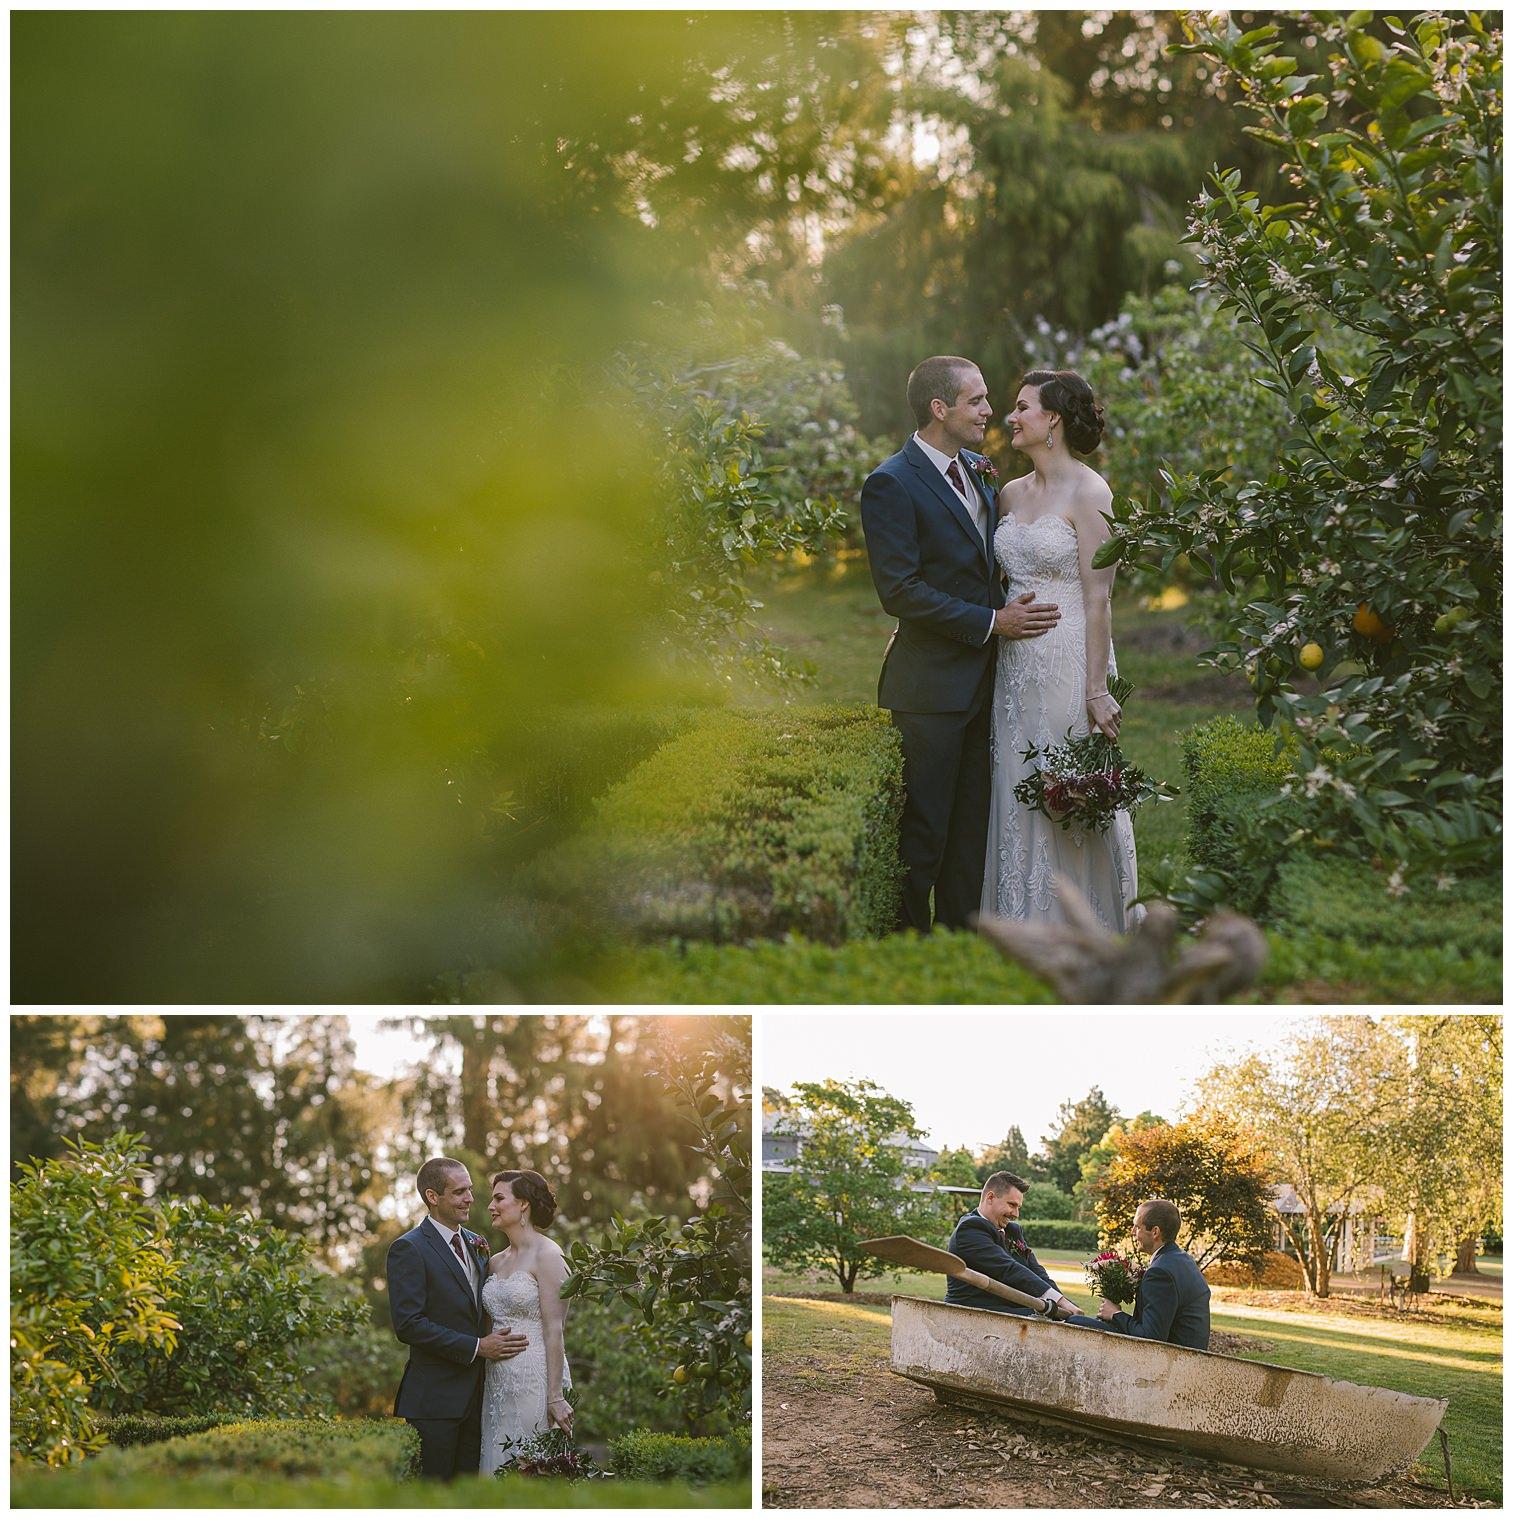 garden wedding photographer, kalinya estate wedding photographer, fun wedding photographer, south coast wedding photographer